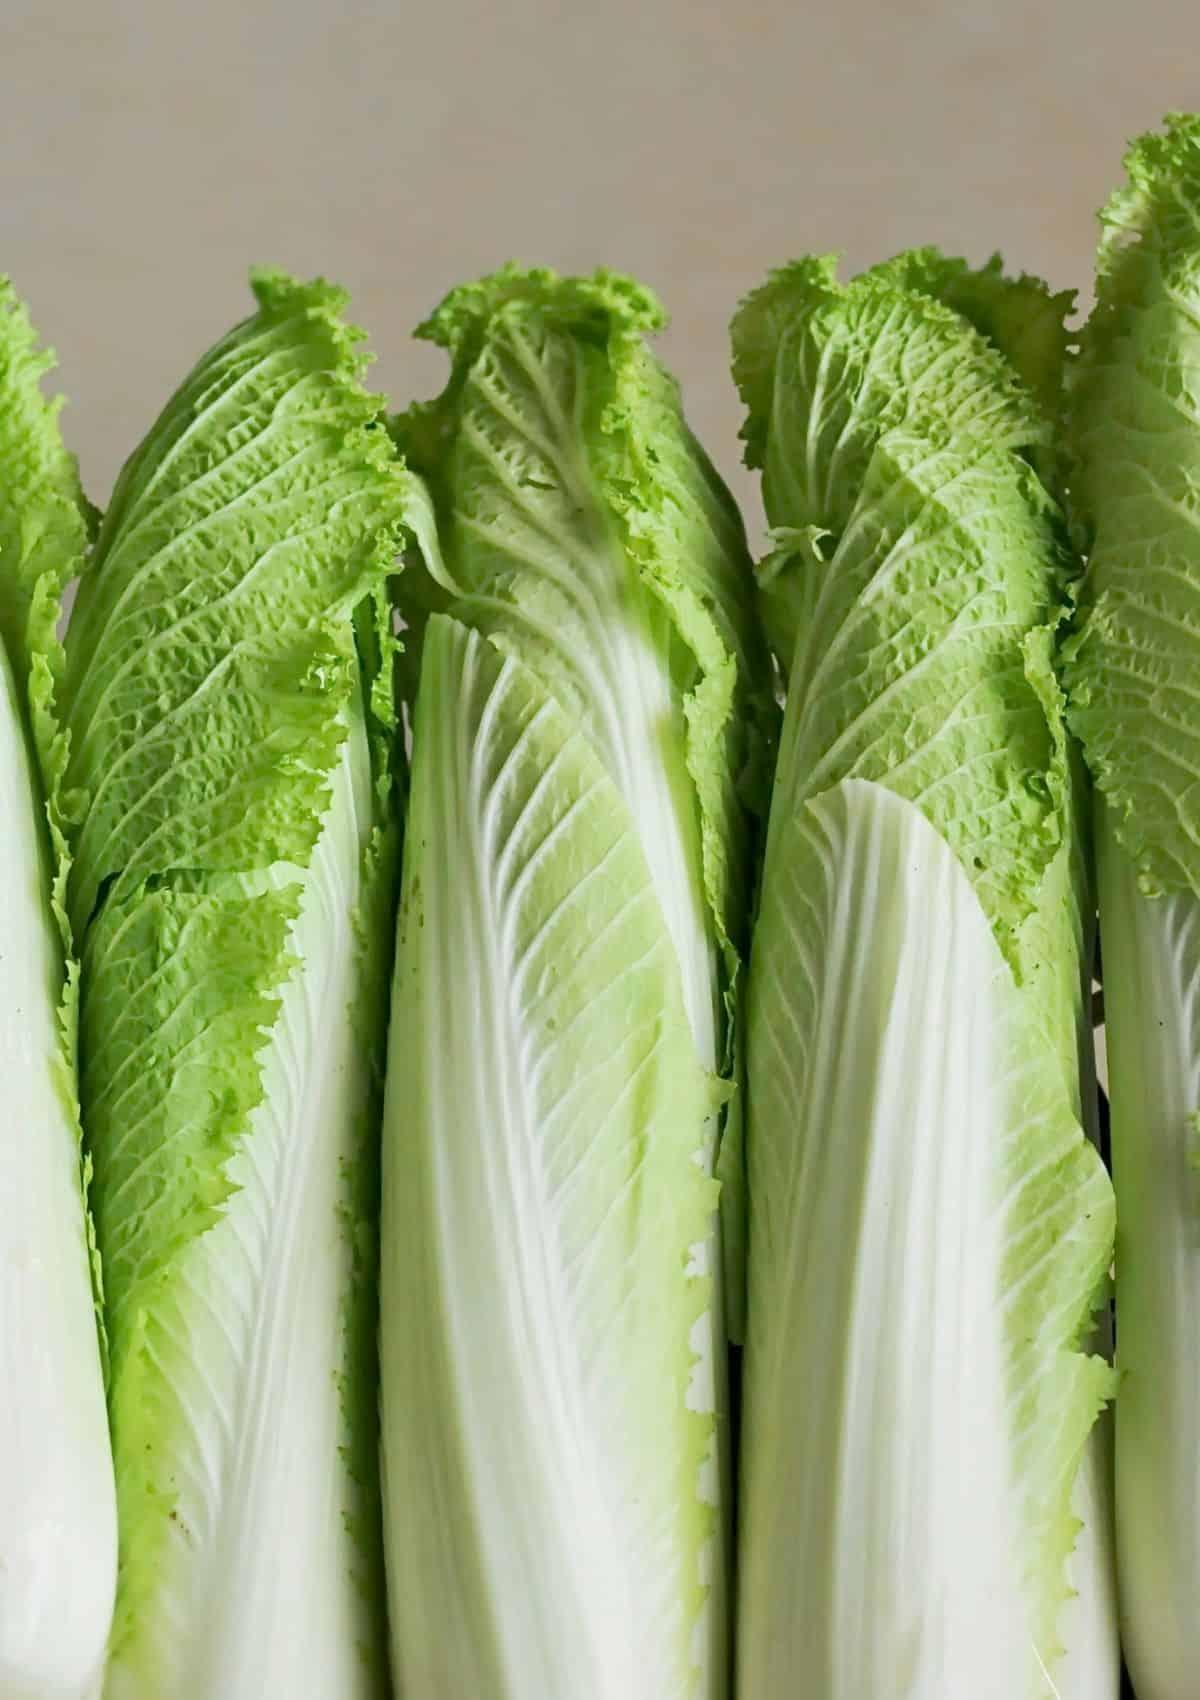 Napa cabbage gathered together.